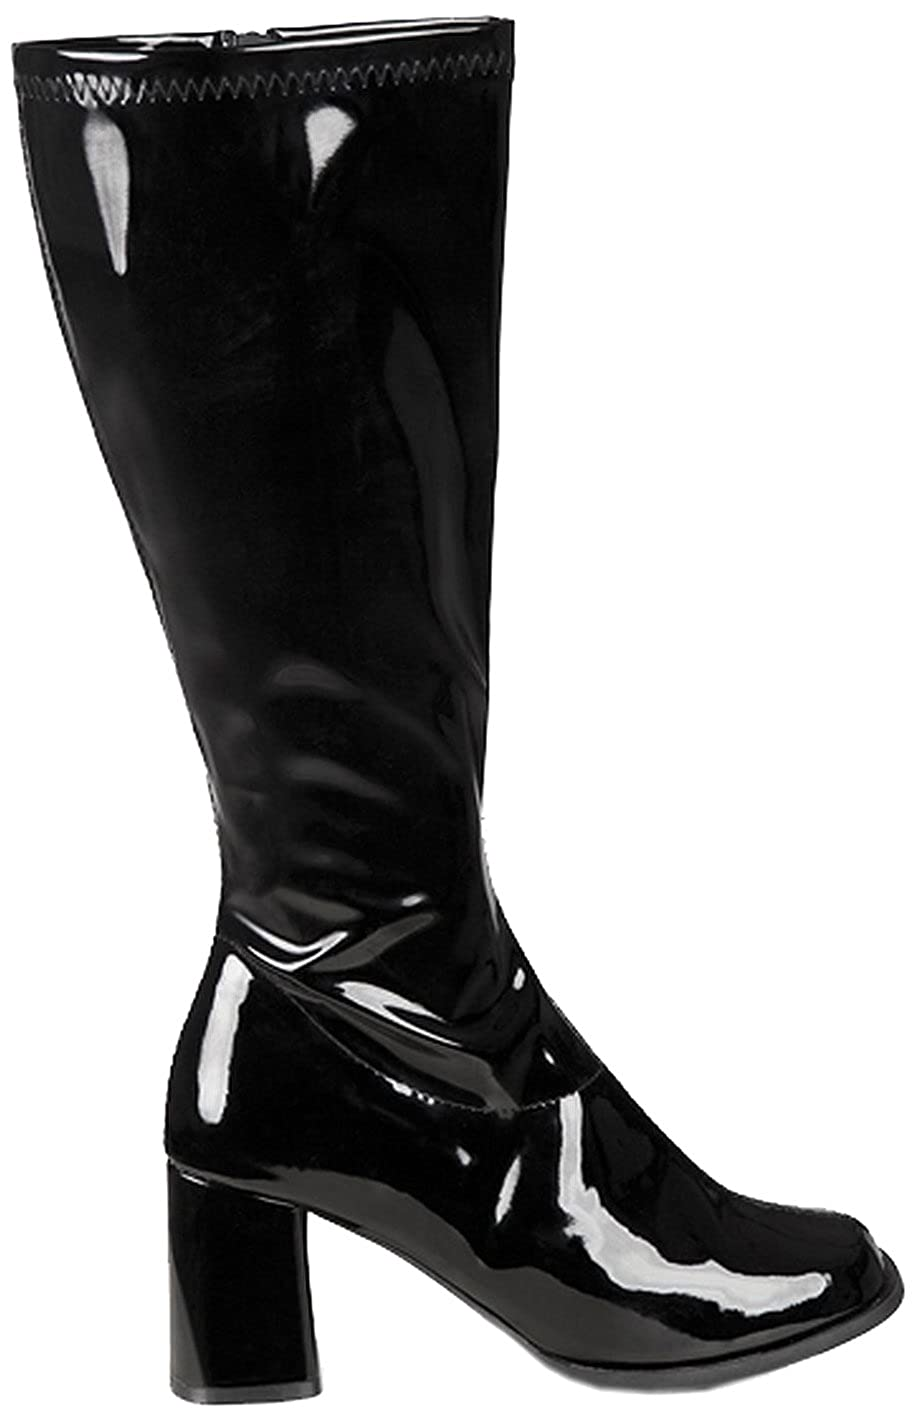 Boland Damen Stiefel, schwarz, 40 EU